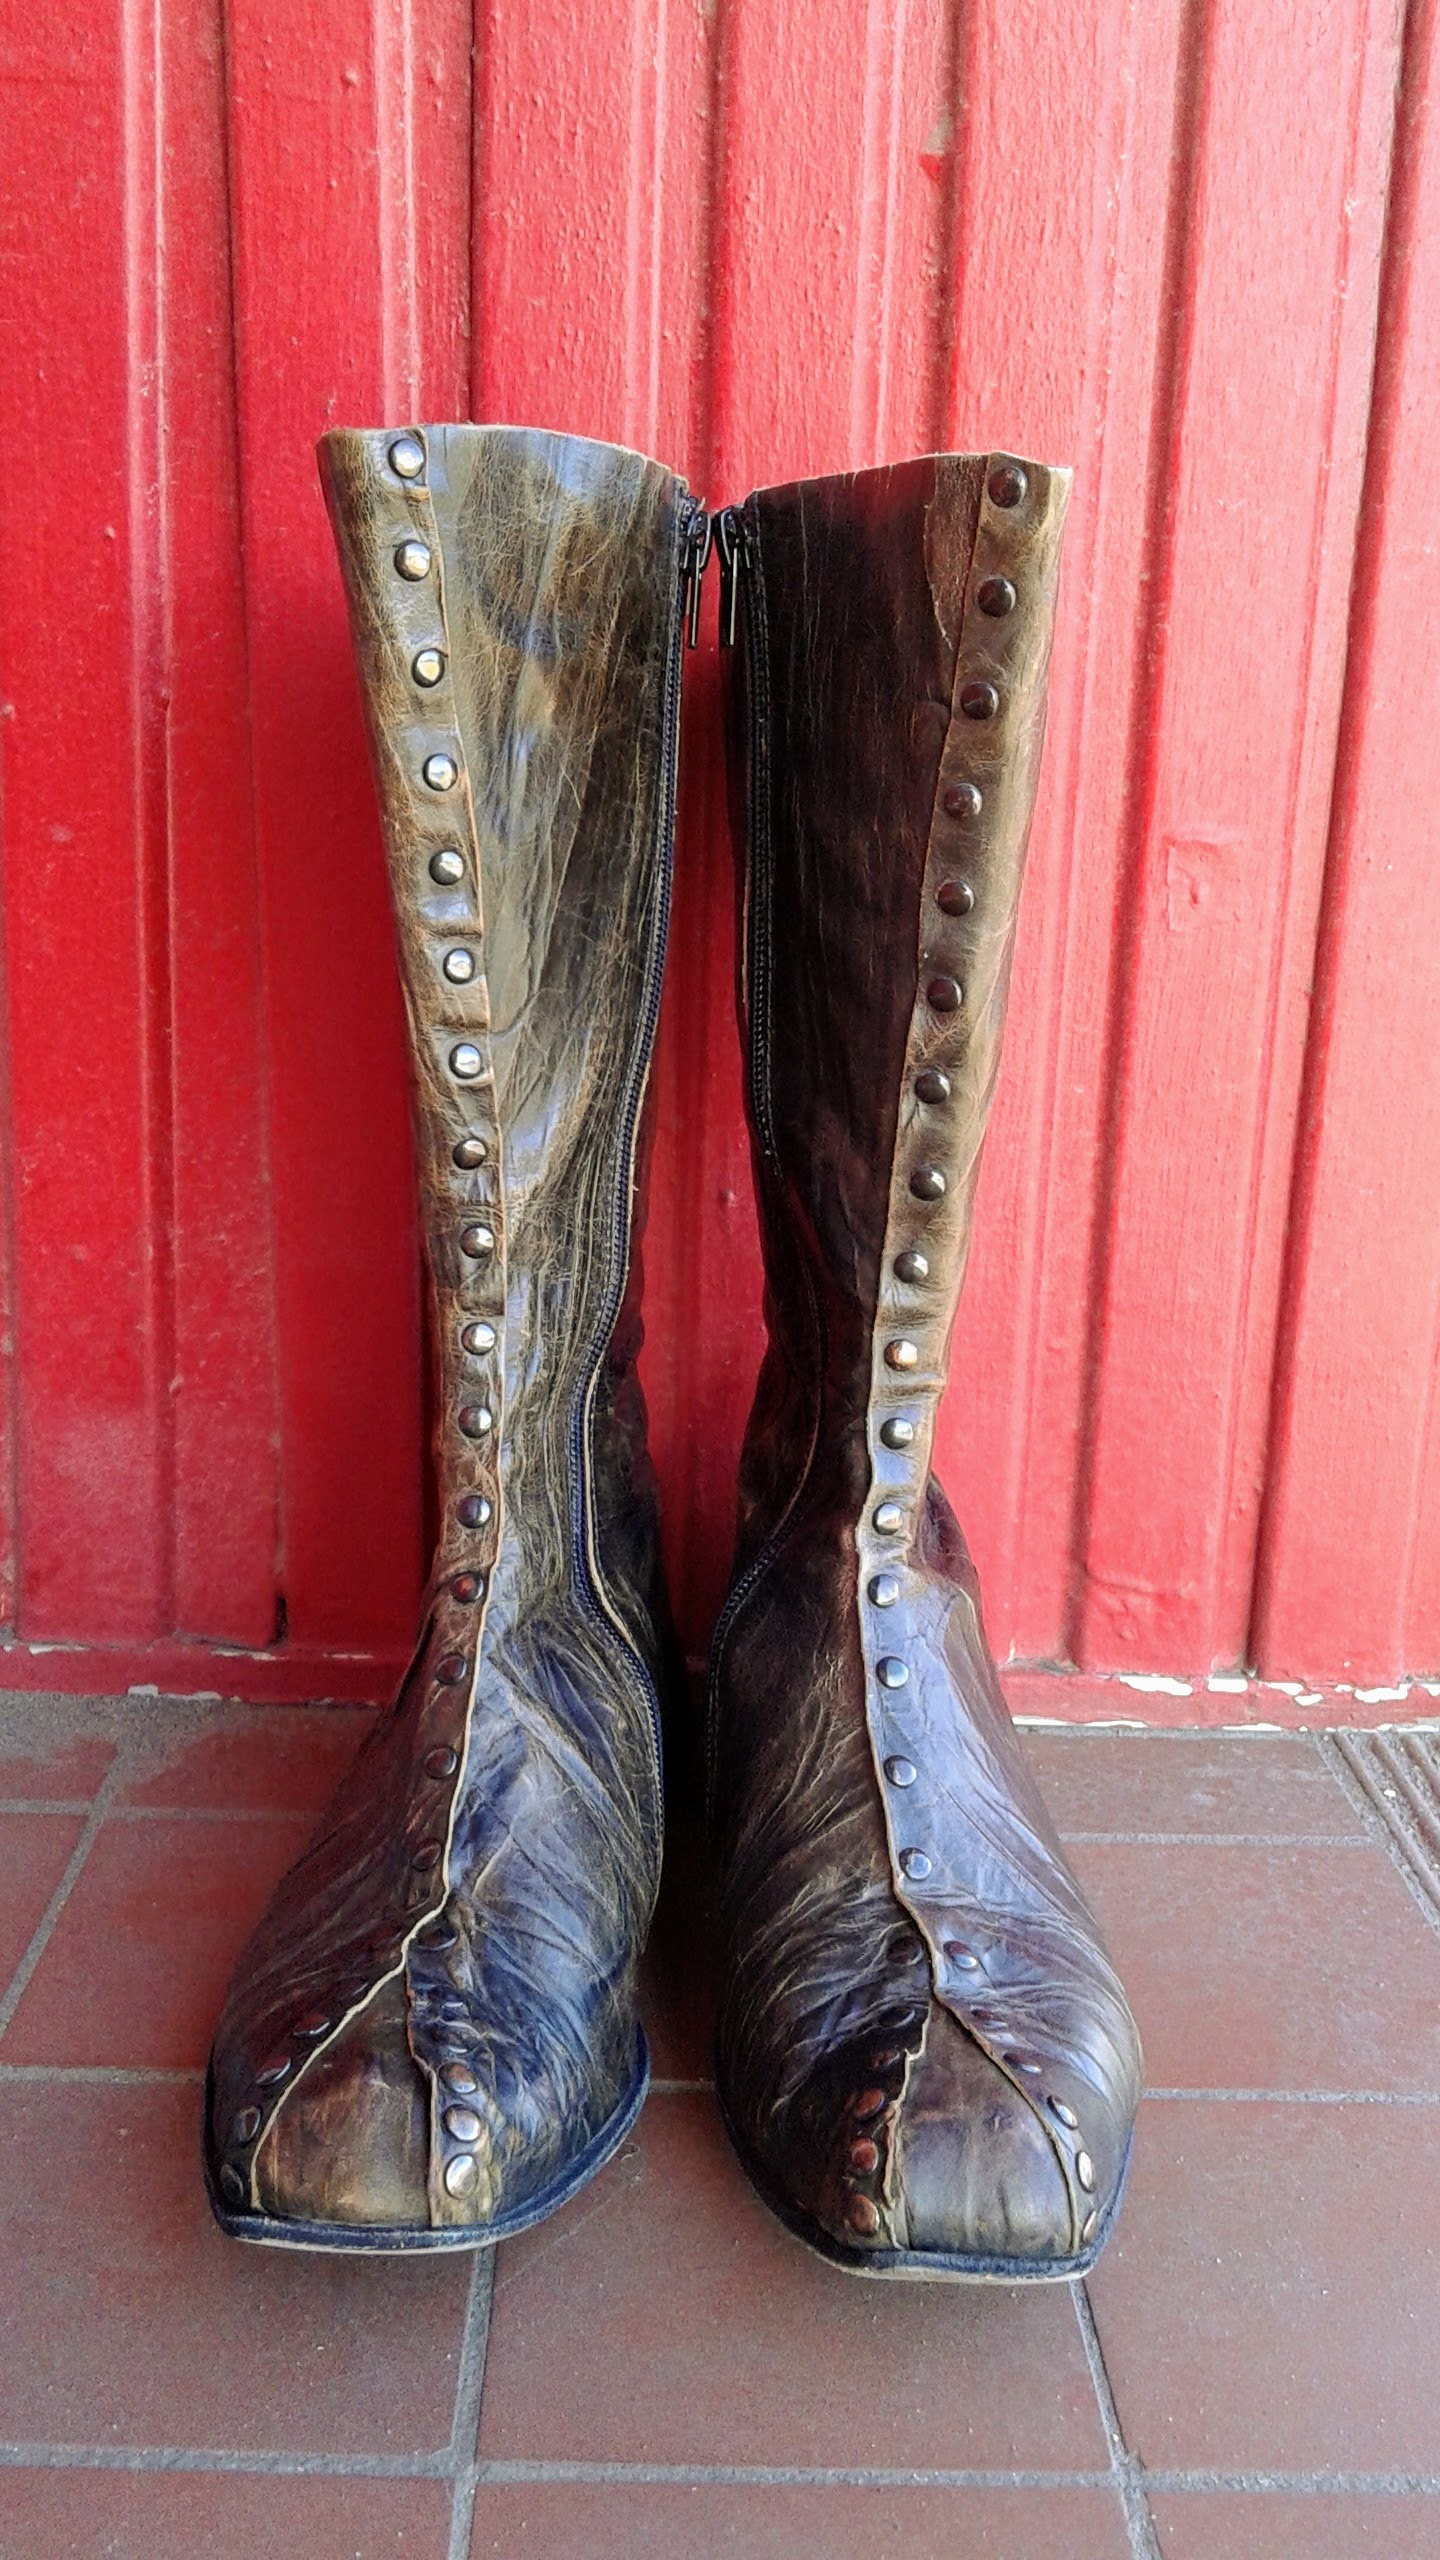 Cydwoq boots; Size 6.5, $225